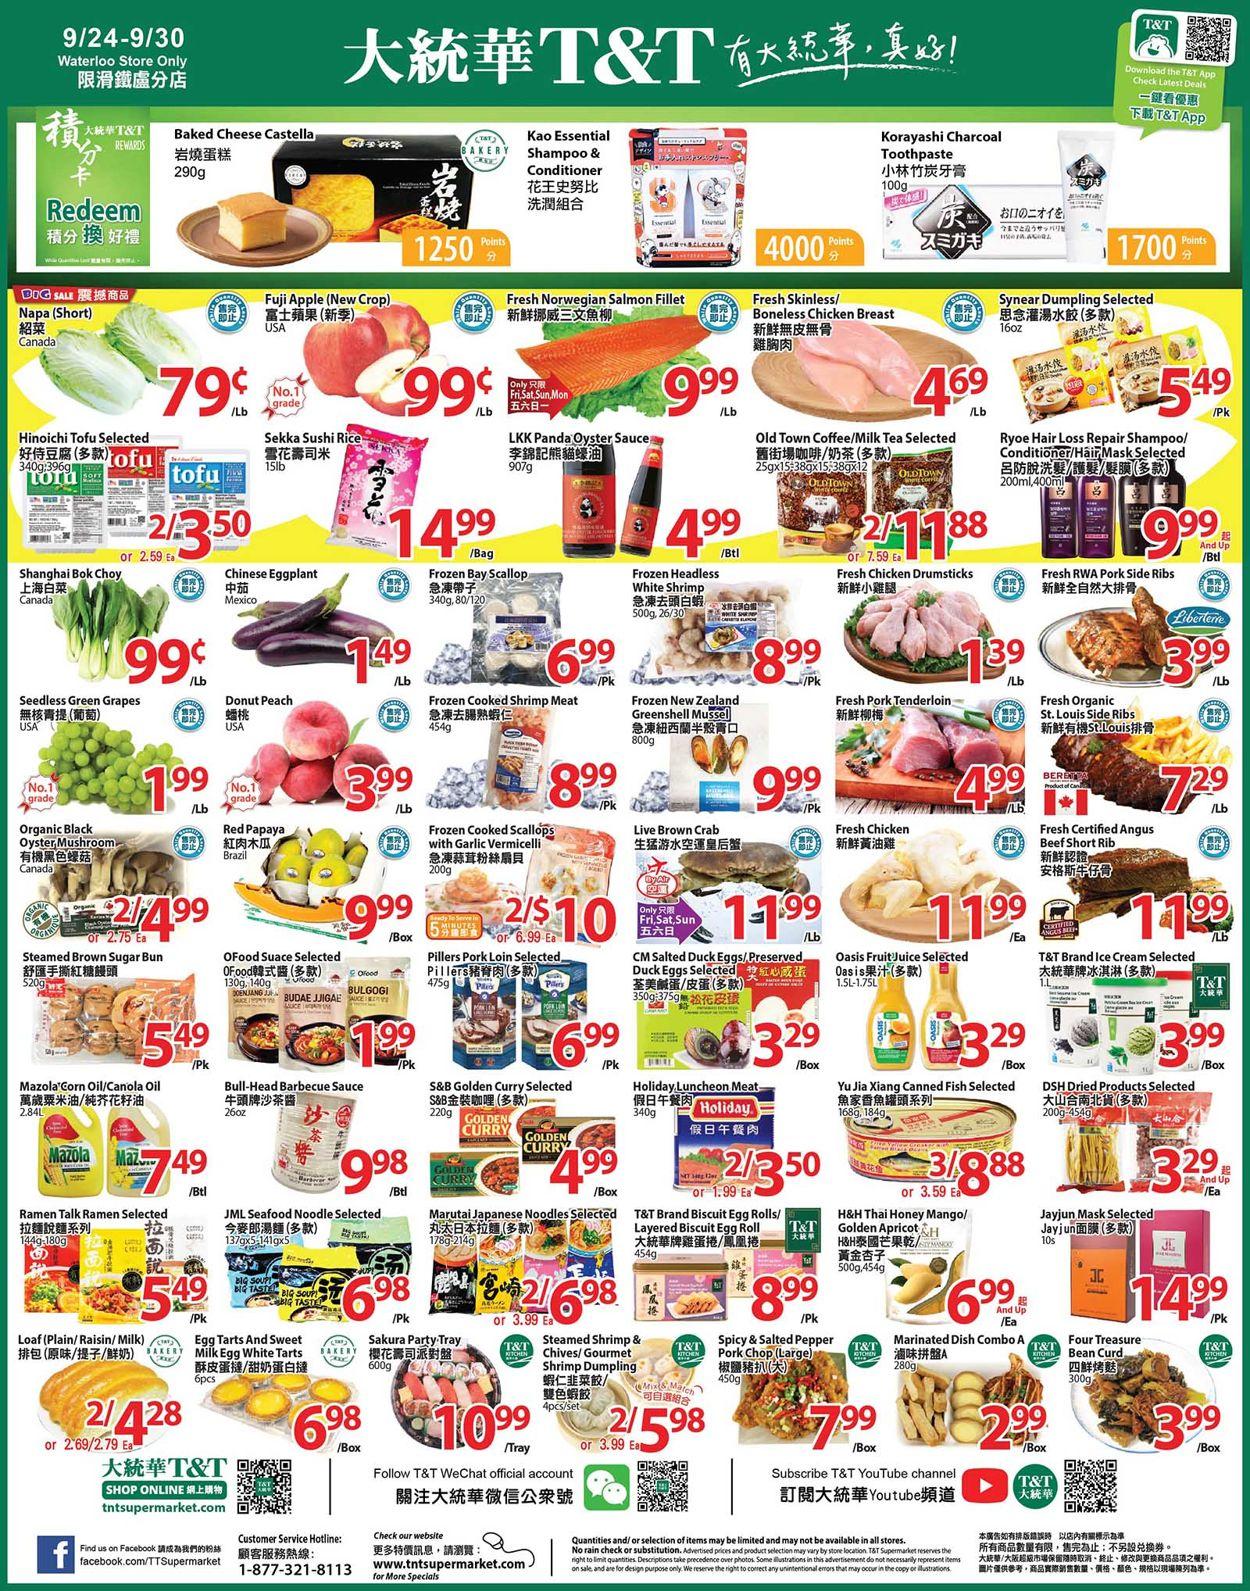 T&T Supermarket - Waterloo Flyer - 09/24-09/30/2021